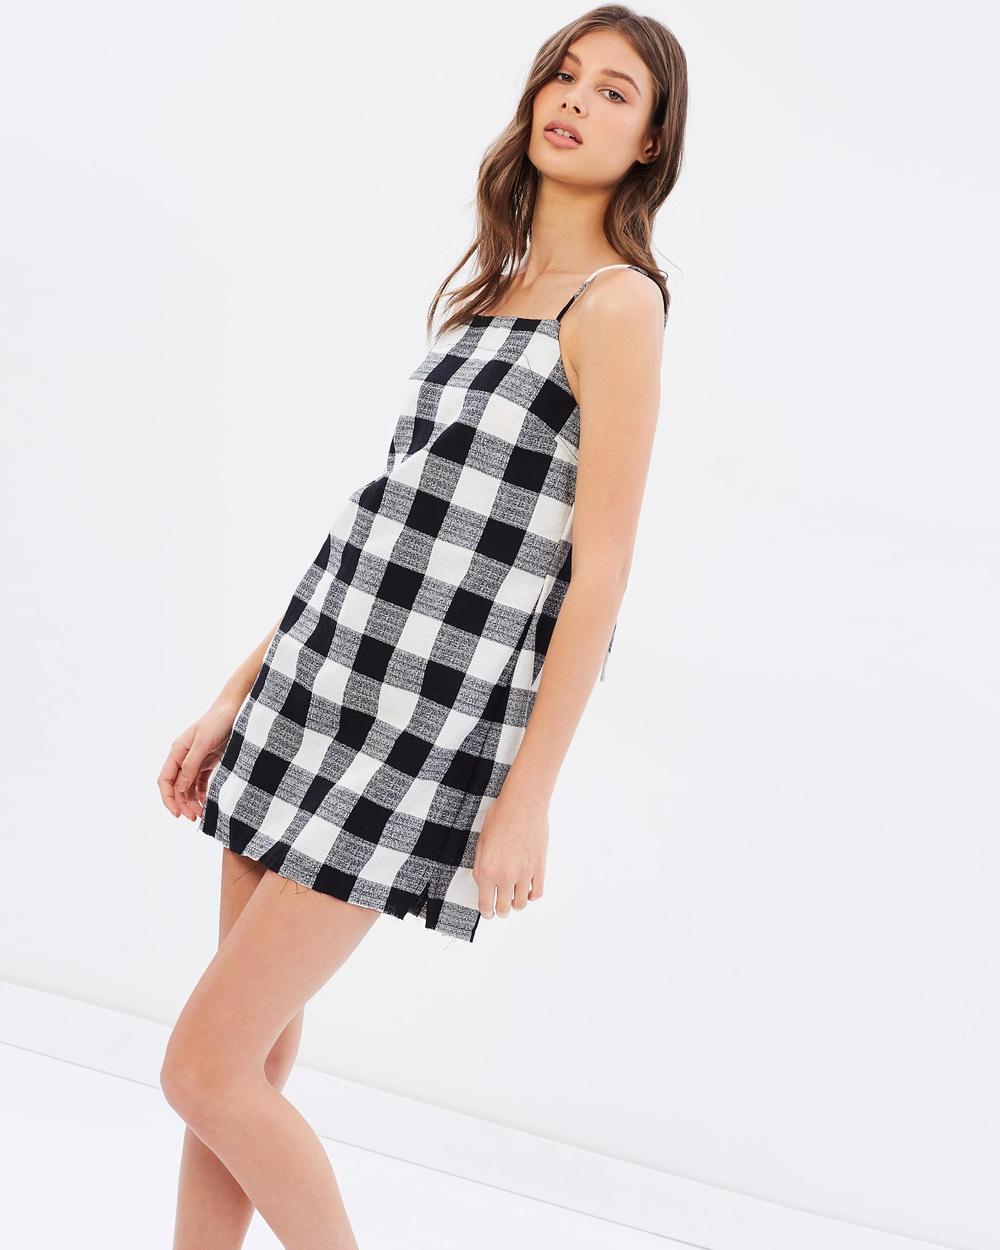 Rue Stiic Gilmore Mini Dress Dresses Check Gilmore Mini Dress